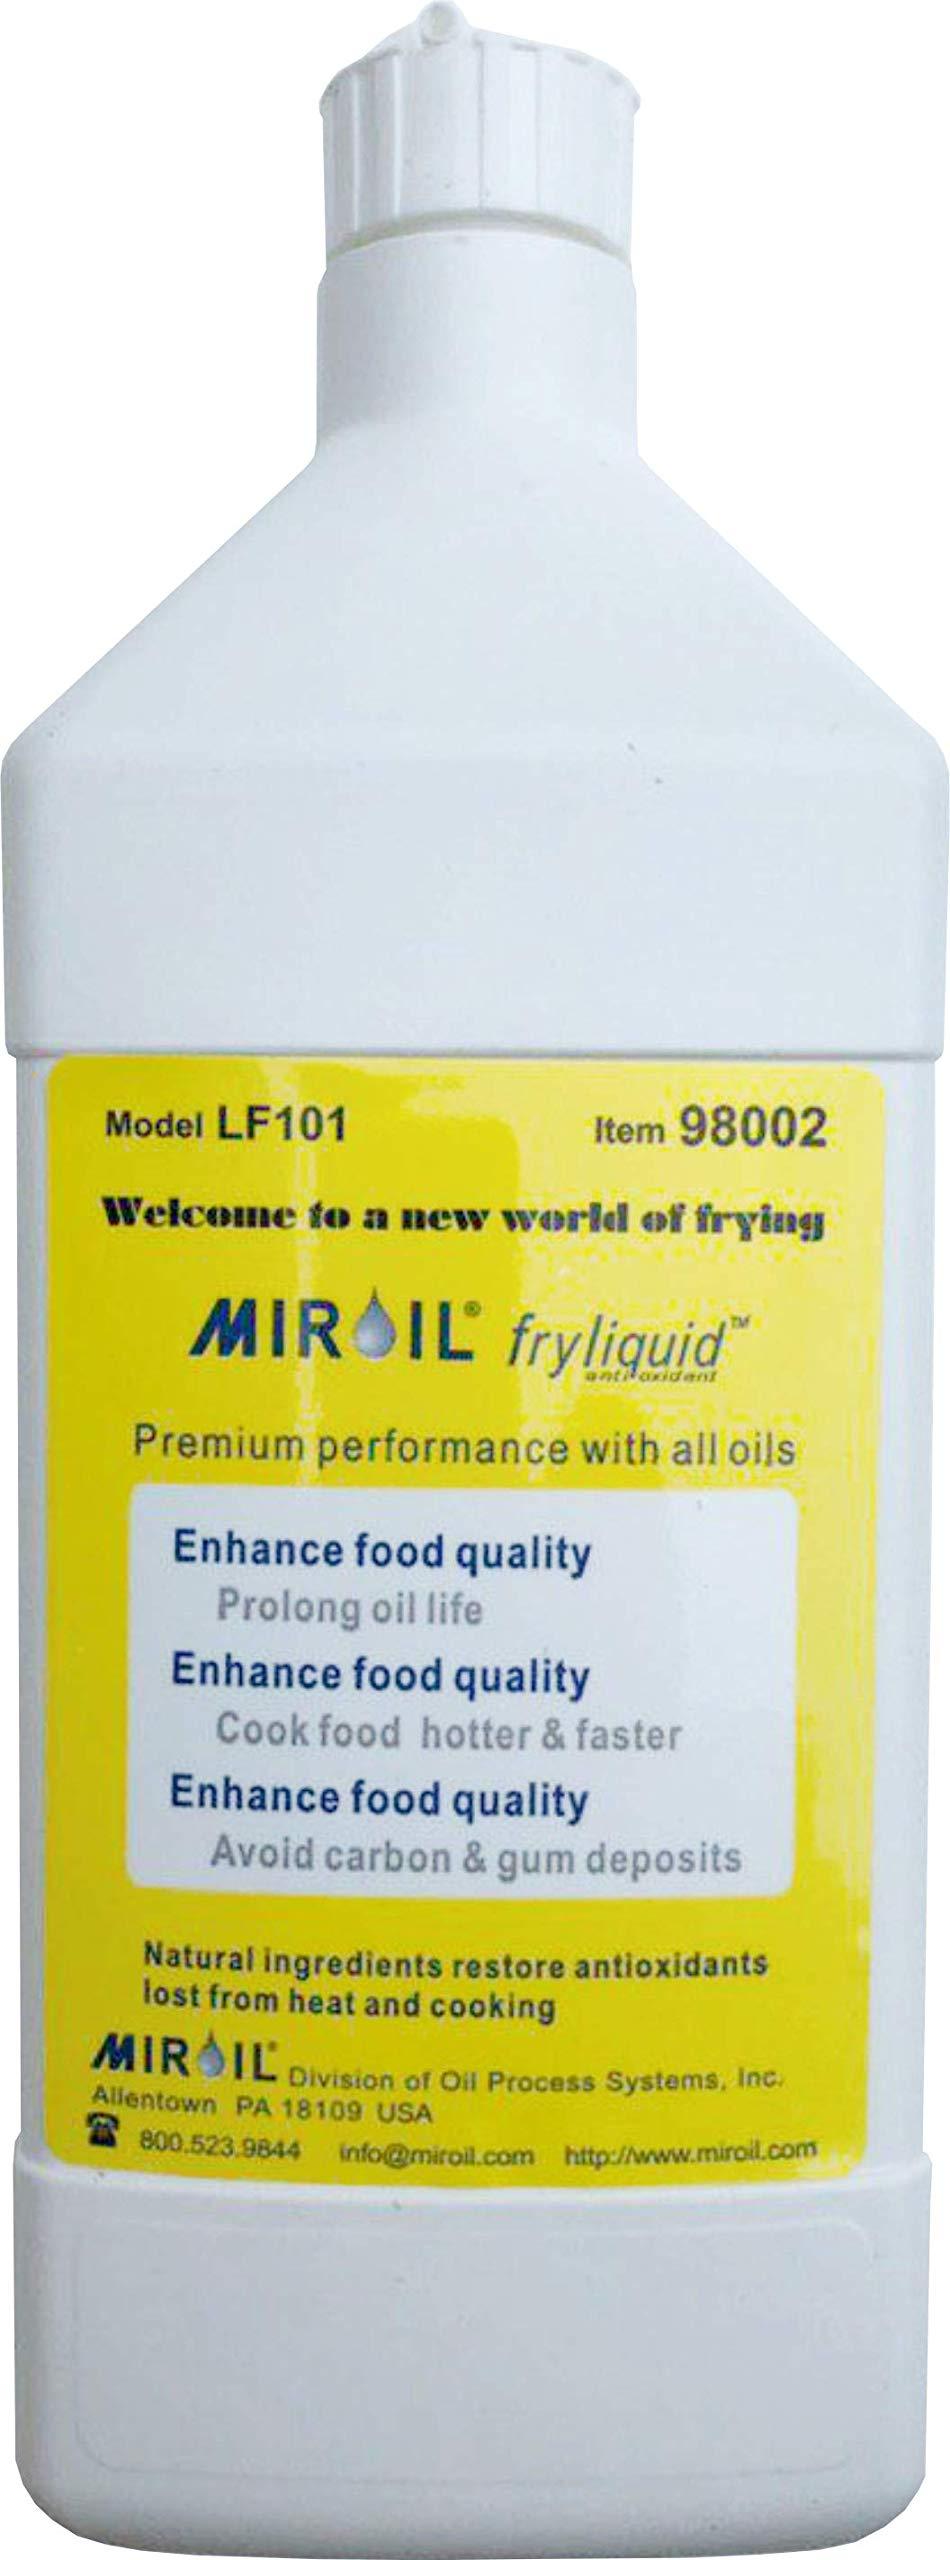 Miroil FryLiquid LF101   1 x 1 Litre Bottle   Antioxidant for Fry Oil   Prevent Oil Breakdown   Fry Healthier   Vitamin Therapy for Deep Fryer Oil   Item 98002   Reduce Oil Costs   1 x 1 litre (1)